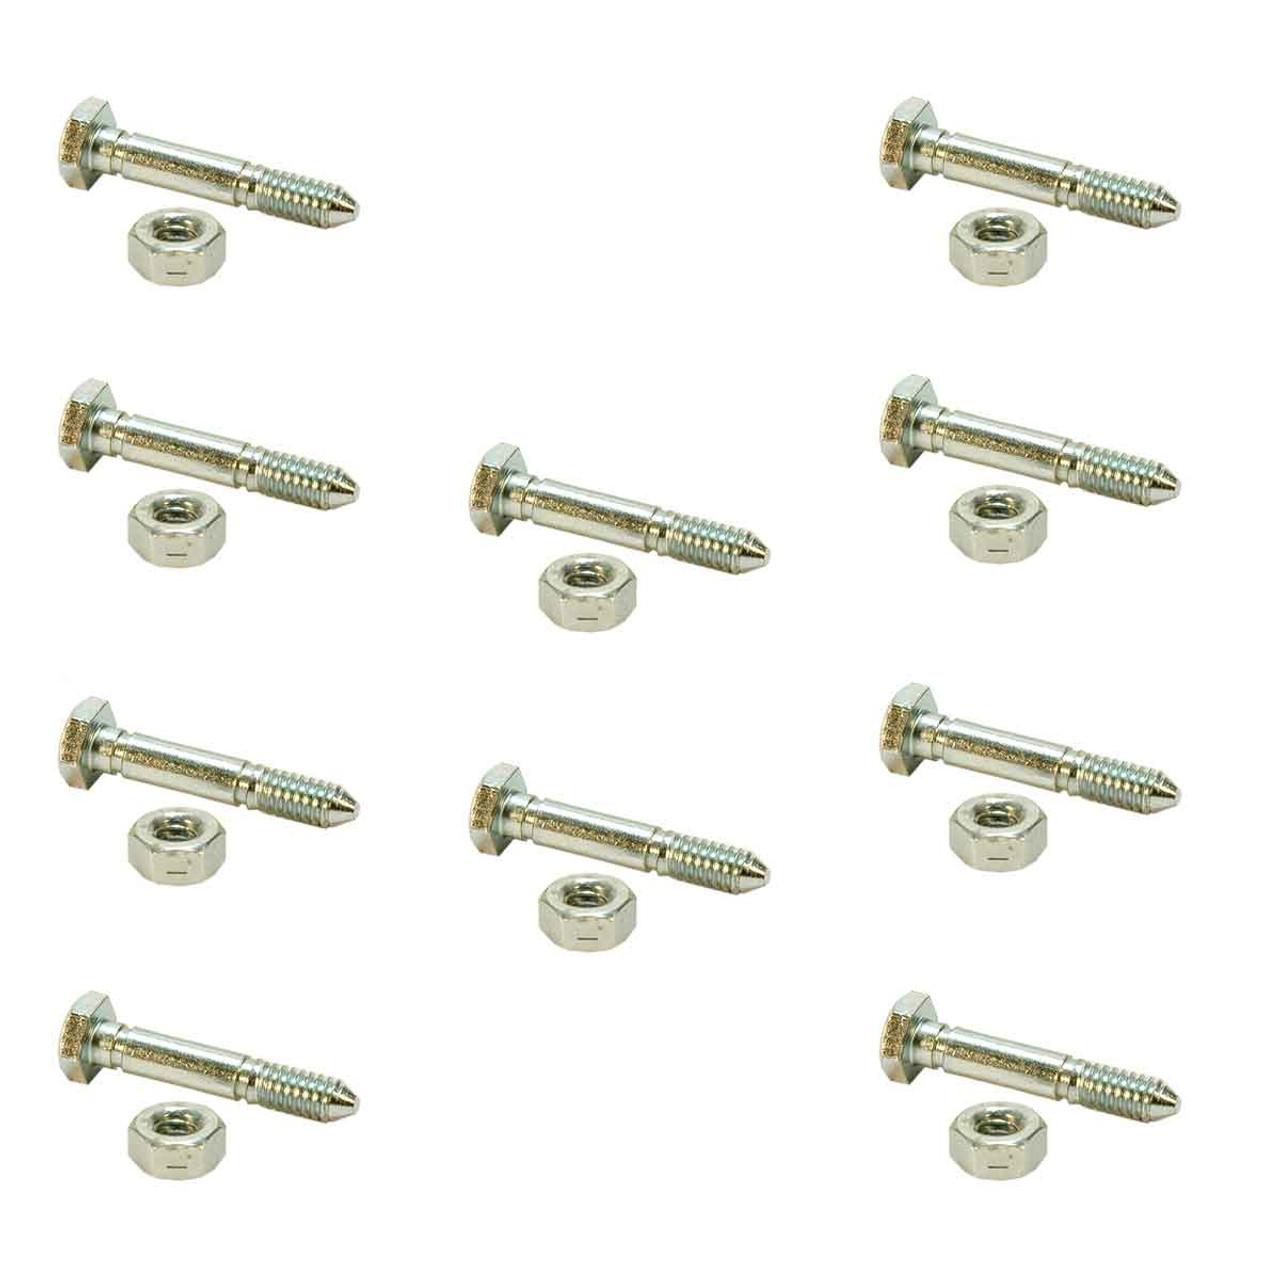 10 Pack Shear Pins Snowblower Fits Ariens 51001500 John Deere AM122156 AM136890